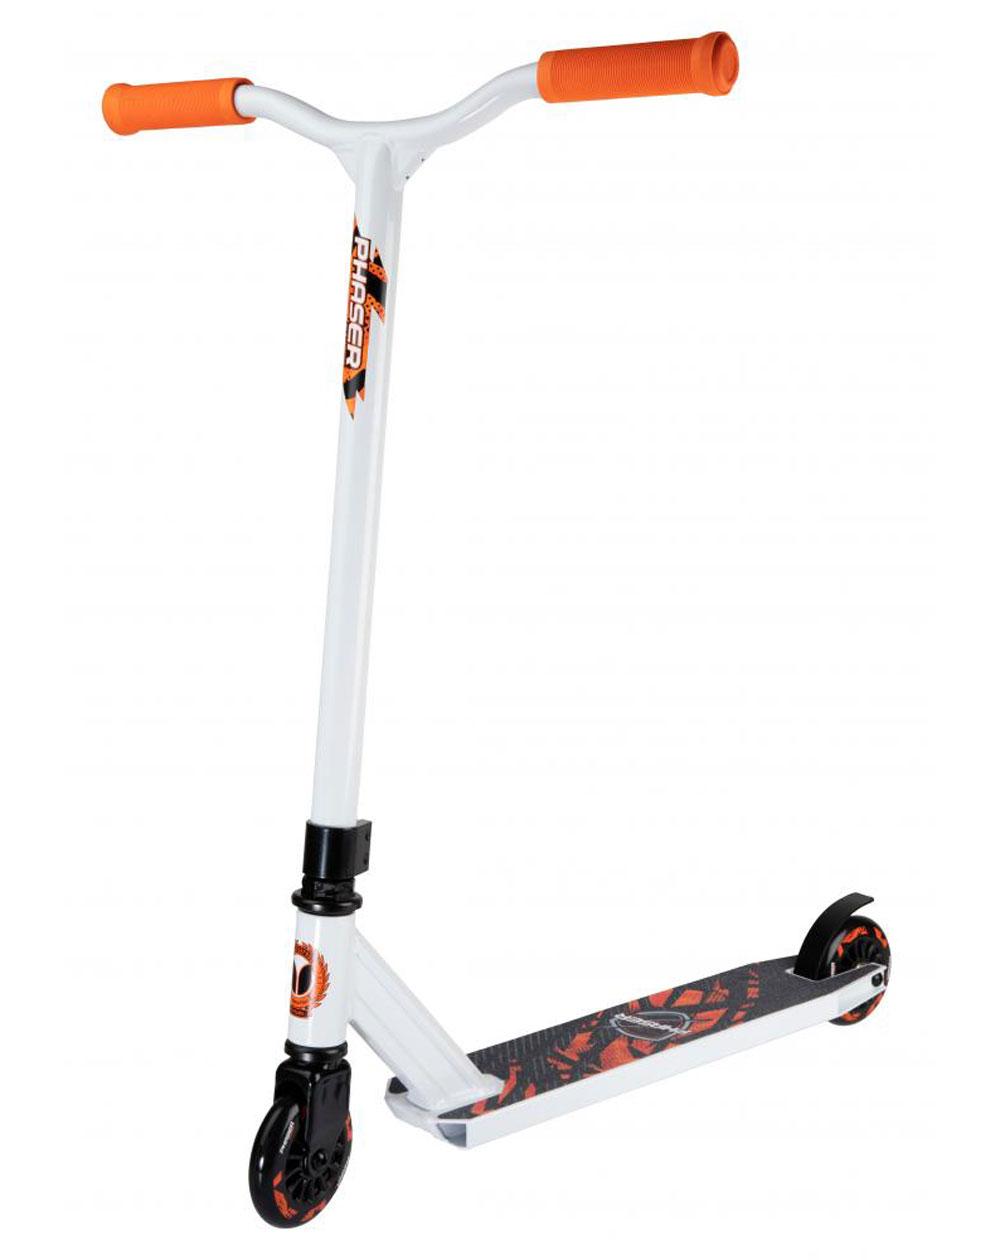 Blazer Pro Phaser 2 Stunt Scooter White